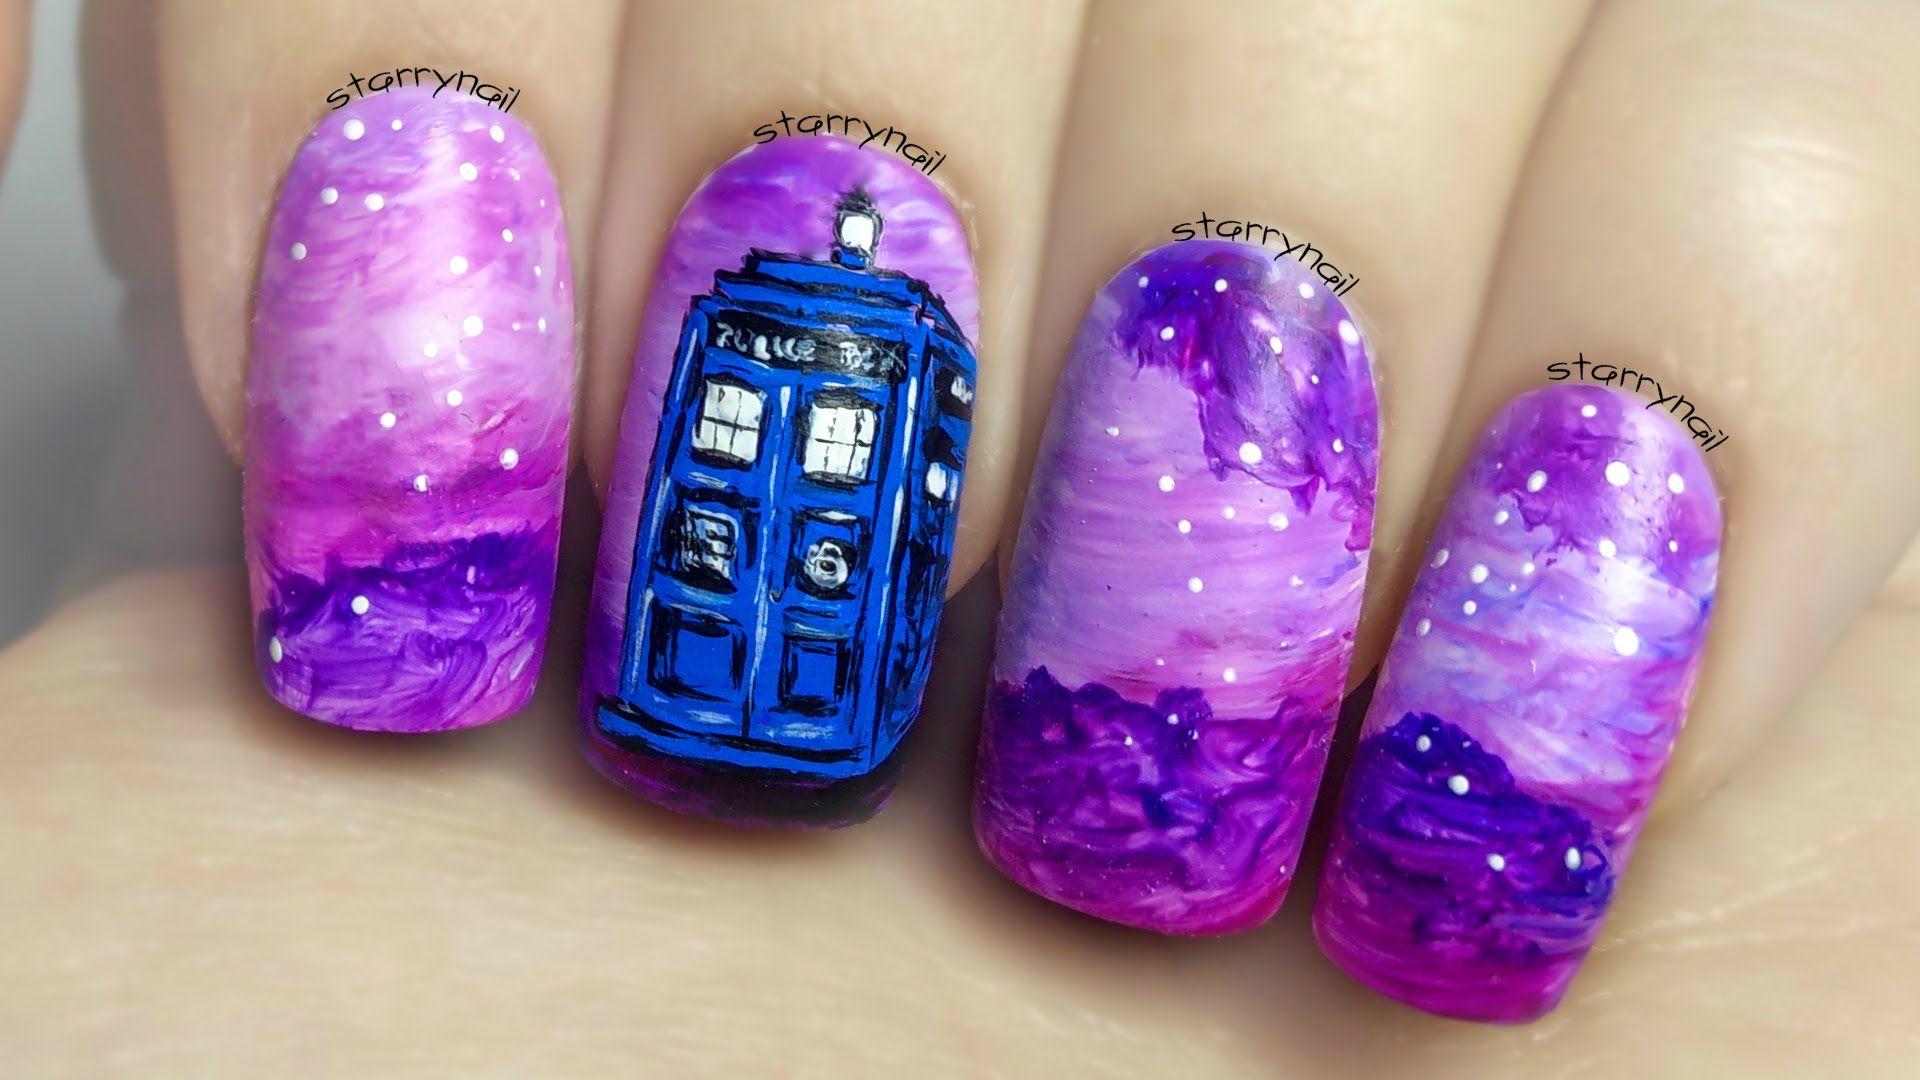 Tardis ⎮ Doctor Who⎮ Freehand Nail Art Tutorial | Beauty Nails ...